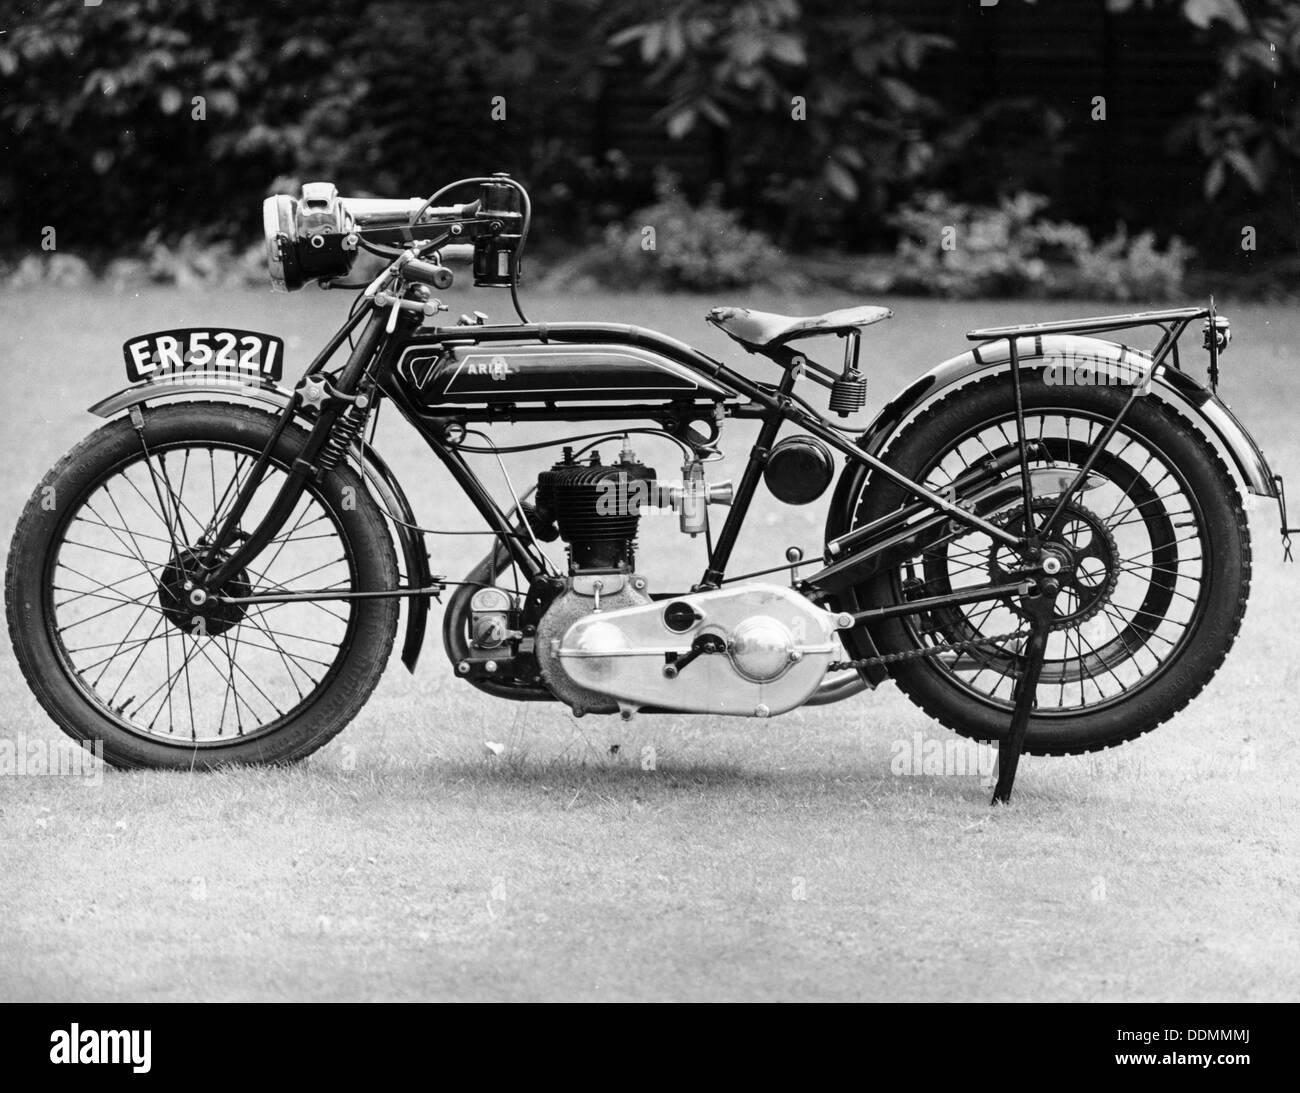 1926 Ariel Motorrad. Artist: Unbekannt Stockfoto